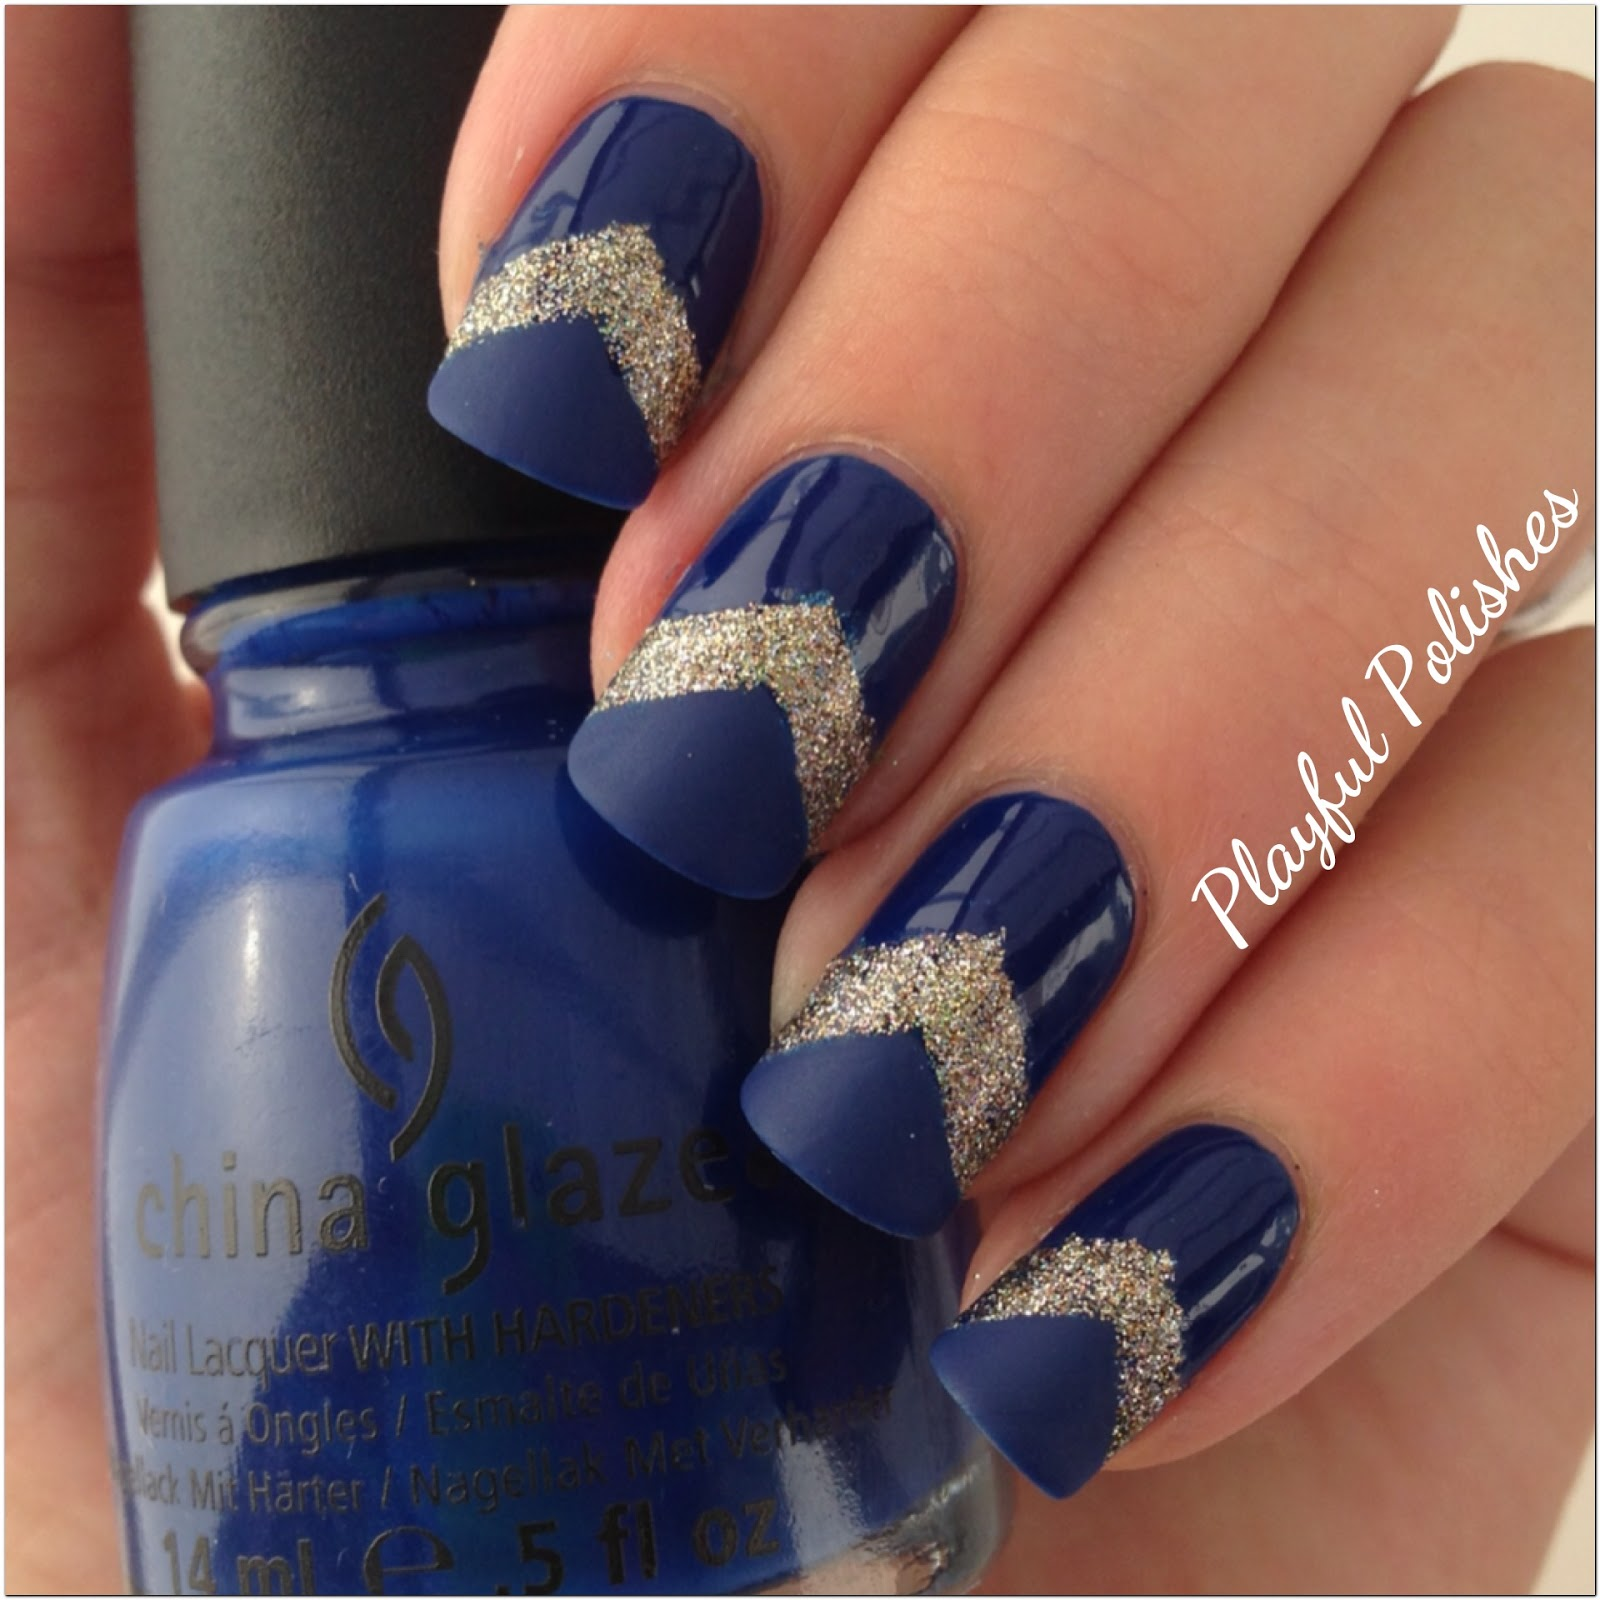 Playful Polishes June Nail Art Challenge Ocean Nails: Playful Polishes: 31 DAY NAIL ART CHALLENGE: BLUE NAILS